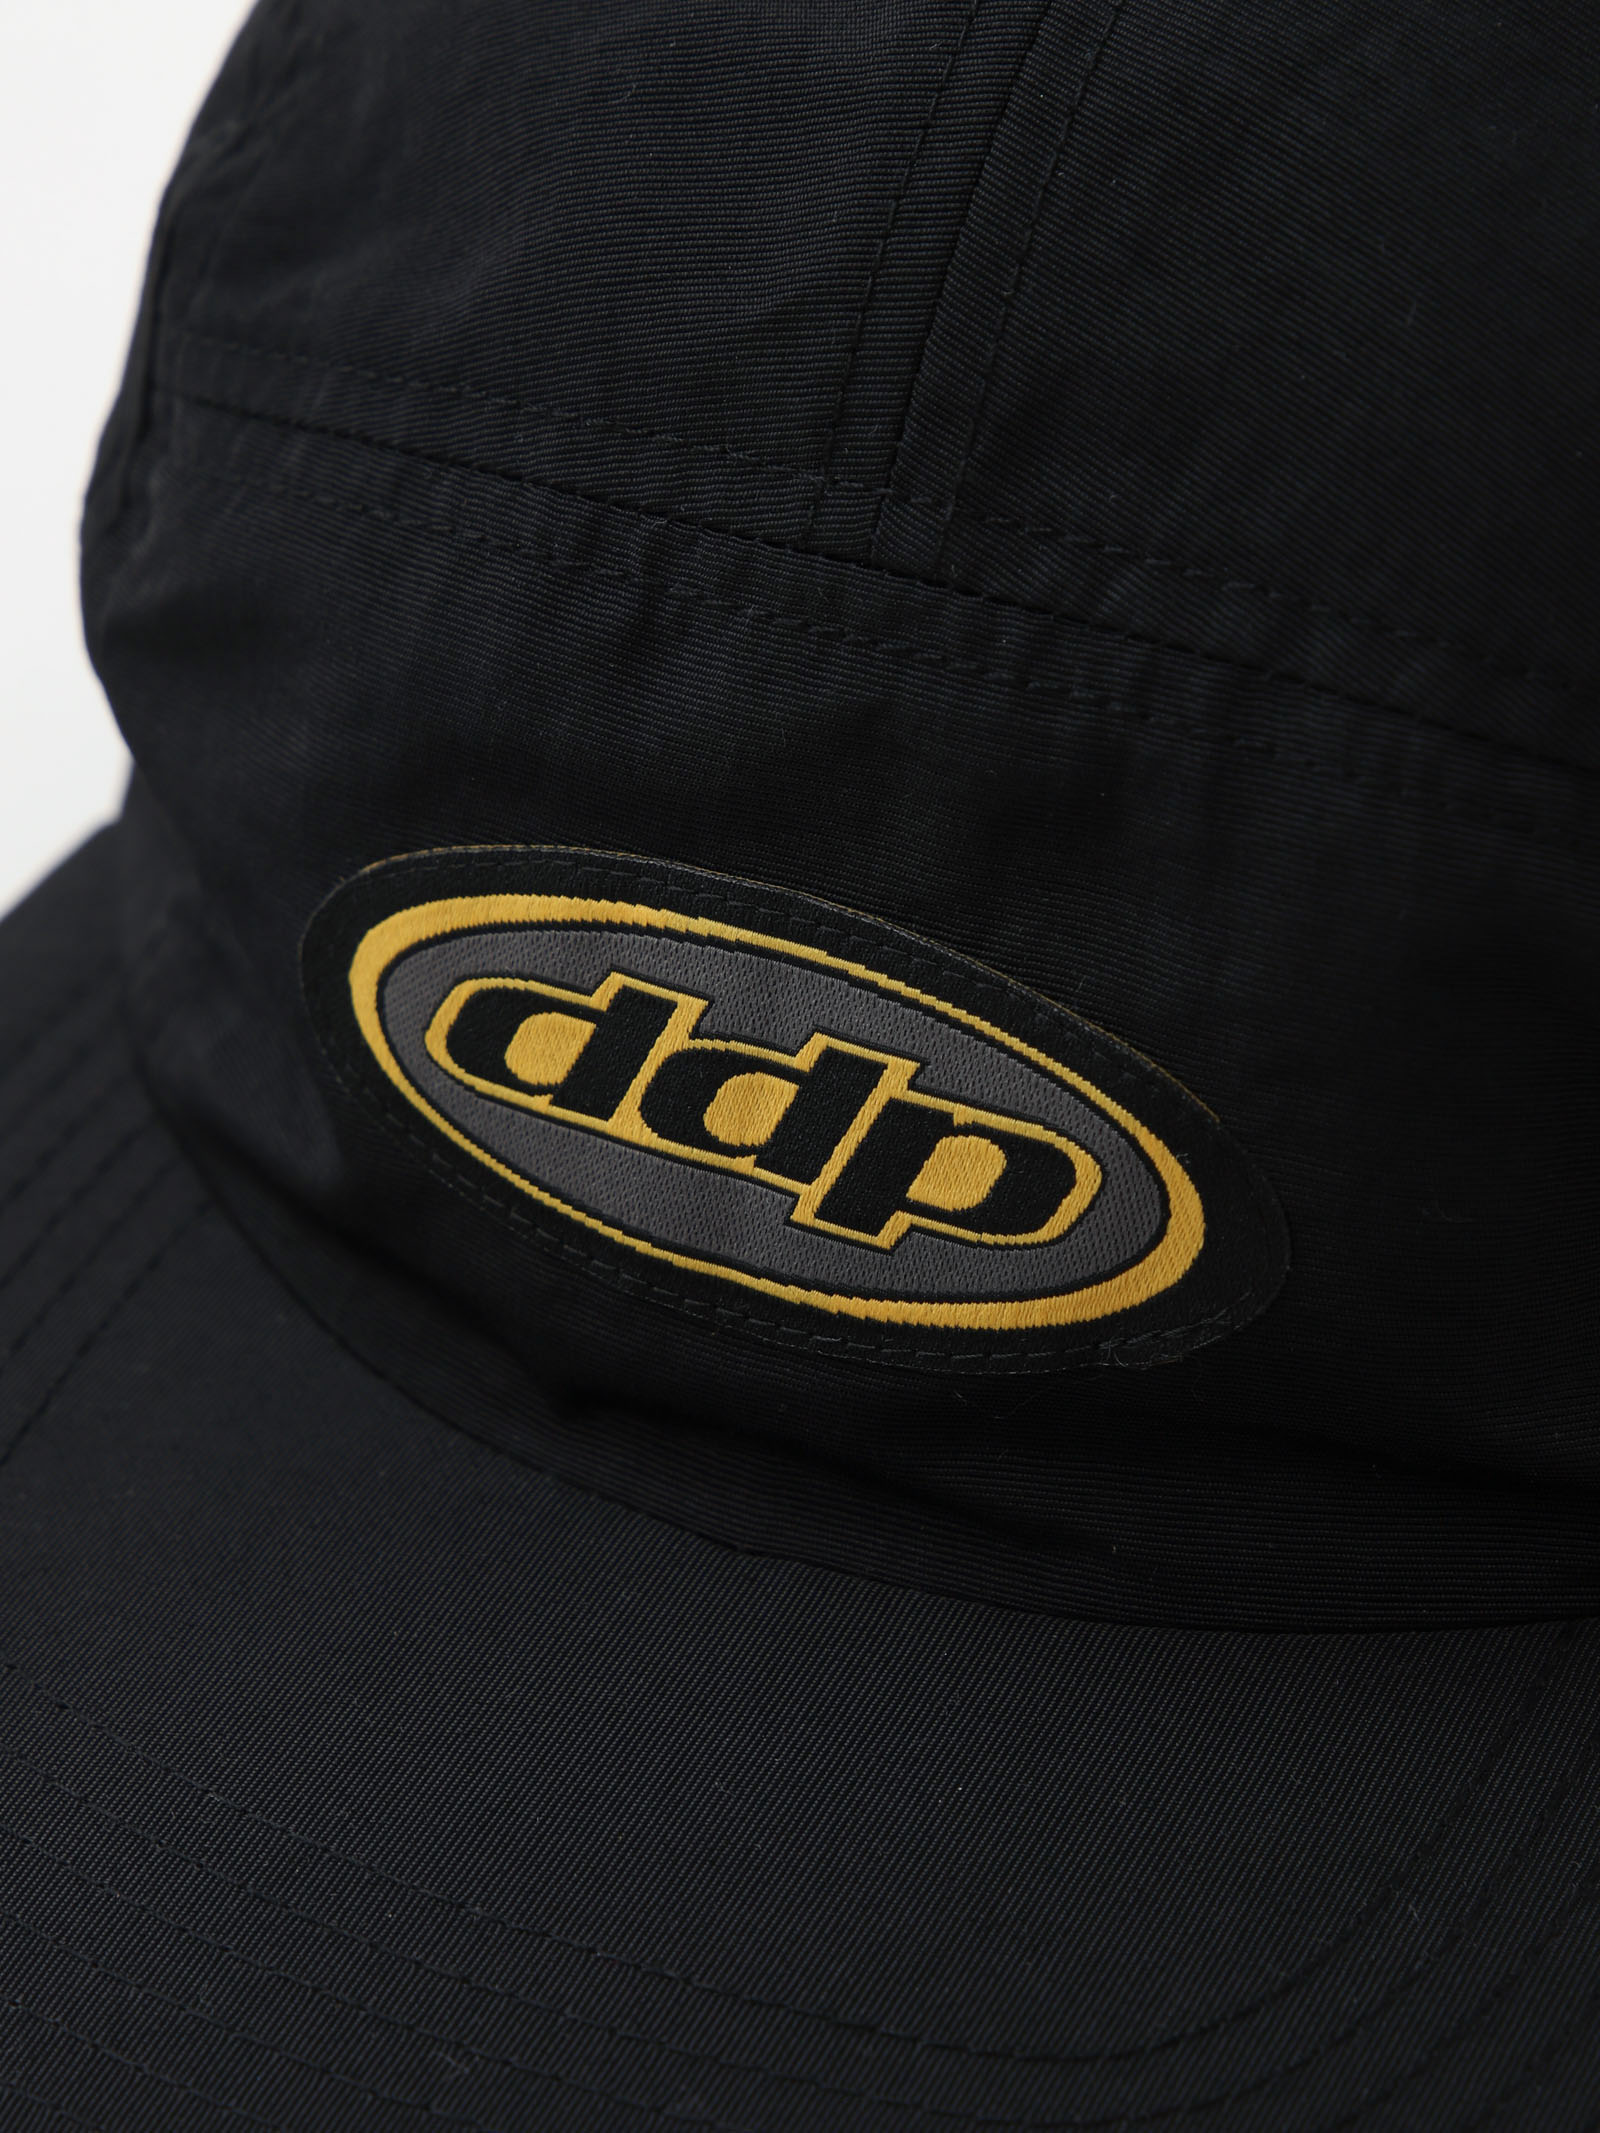 "ddp ARCHIVE LOGO JET CAP ""Garcia""のサムネイル5"